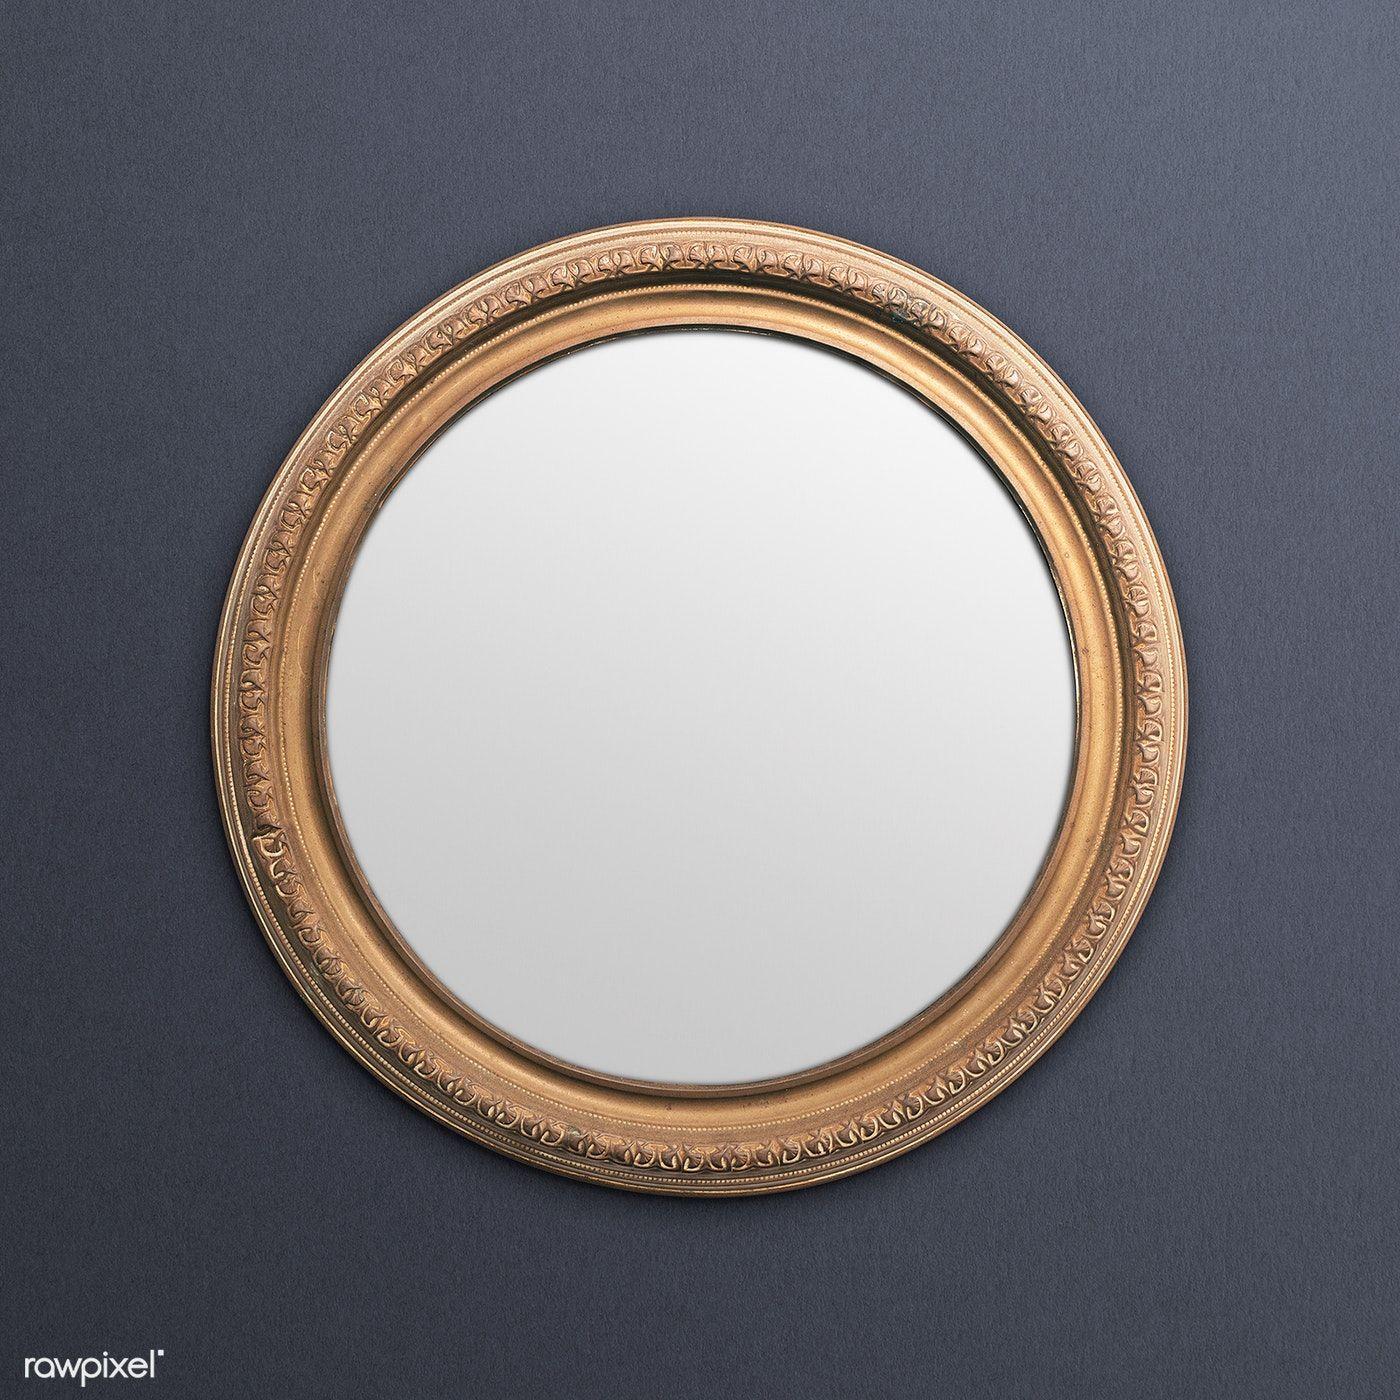 Download Premium Psd Of Vintage Round Gold Picture Frame Mockup In 2020 Gold Picture Frames Frame Mockups Vintage Picture Frames